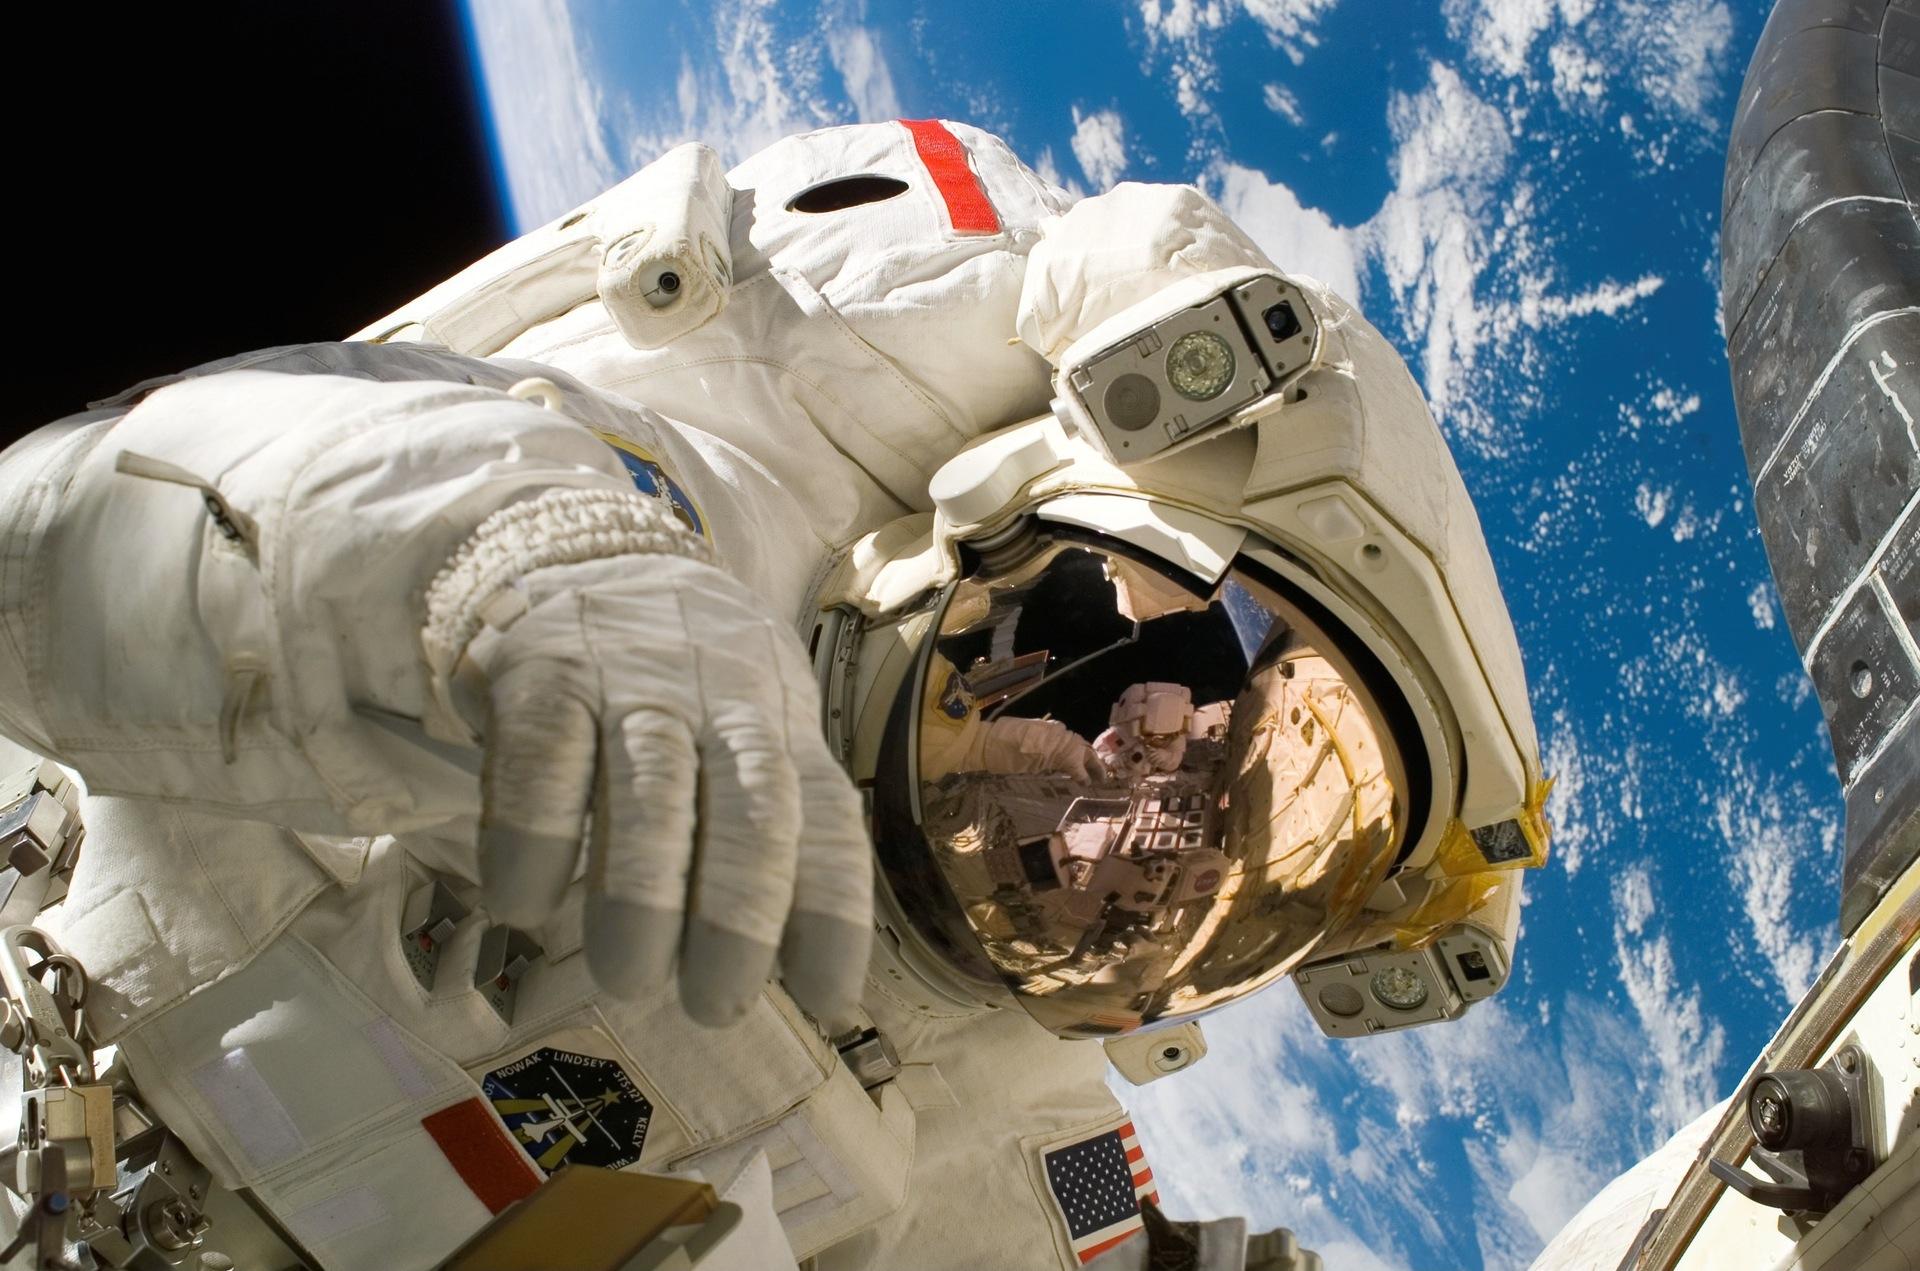 Astronauta, Terra, spazio, tuta spaziale, orbita - Sfondi HD - Professor-falken.com